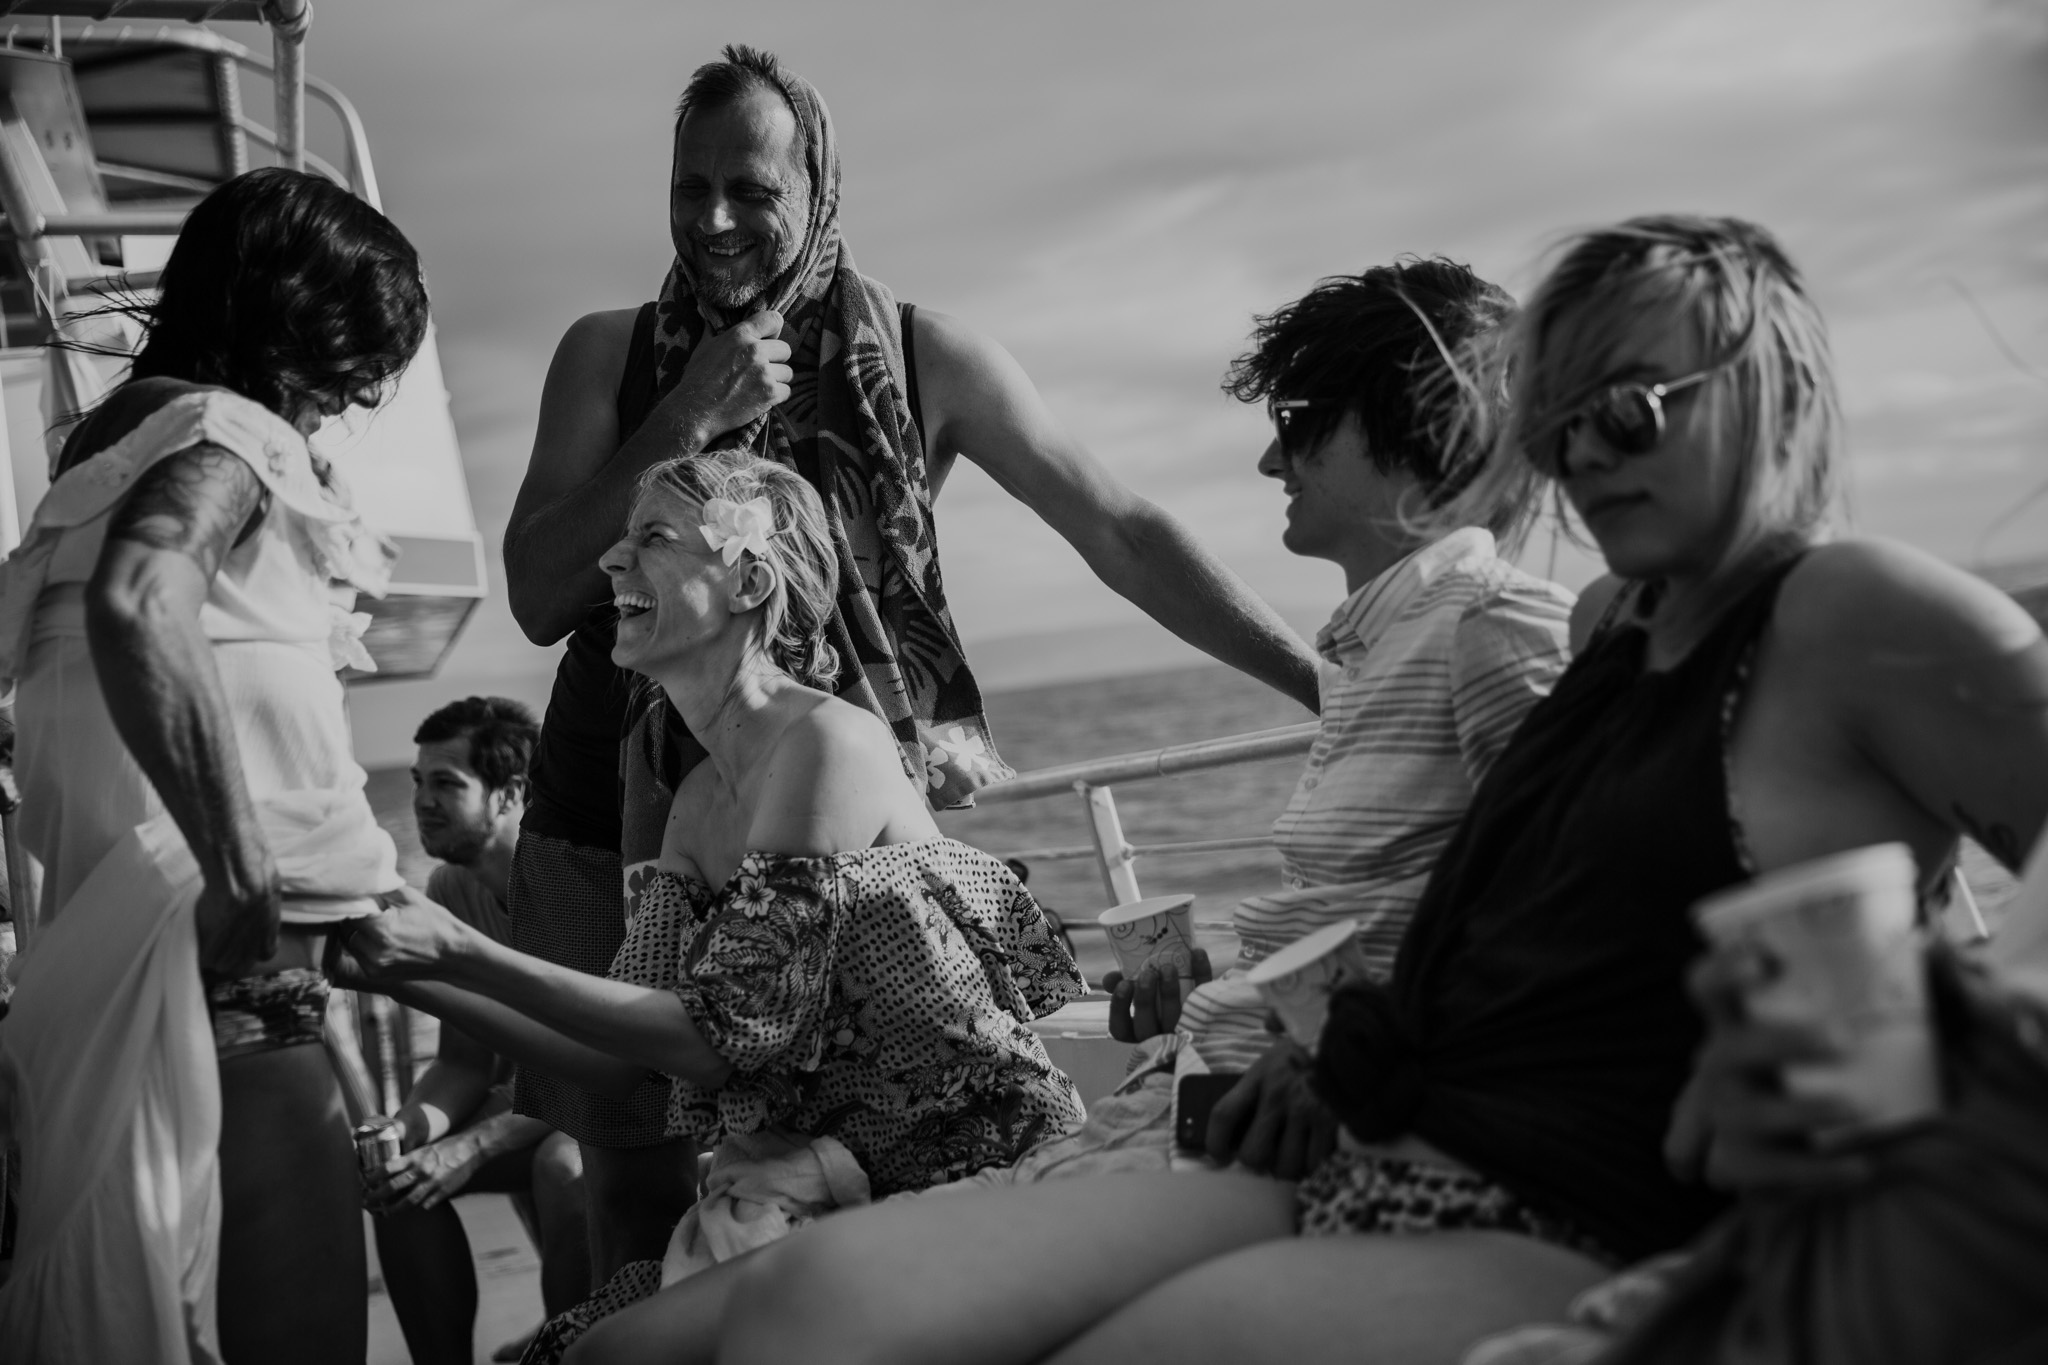 wedding-vow-renewal-hawaii-hochzeit-maui-silberhochzeit-karol-and-jens_163.jpg